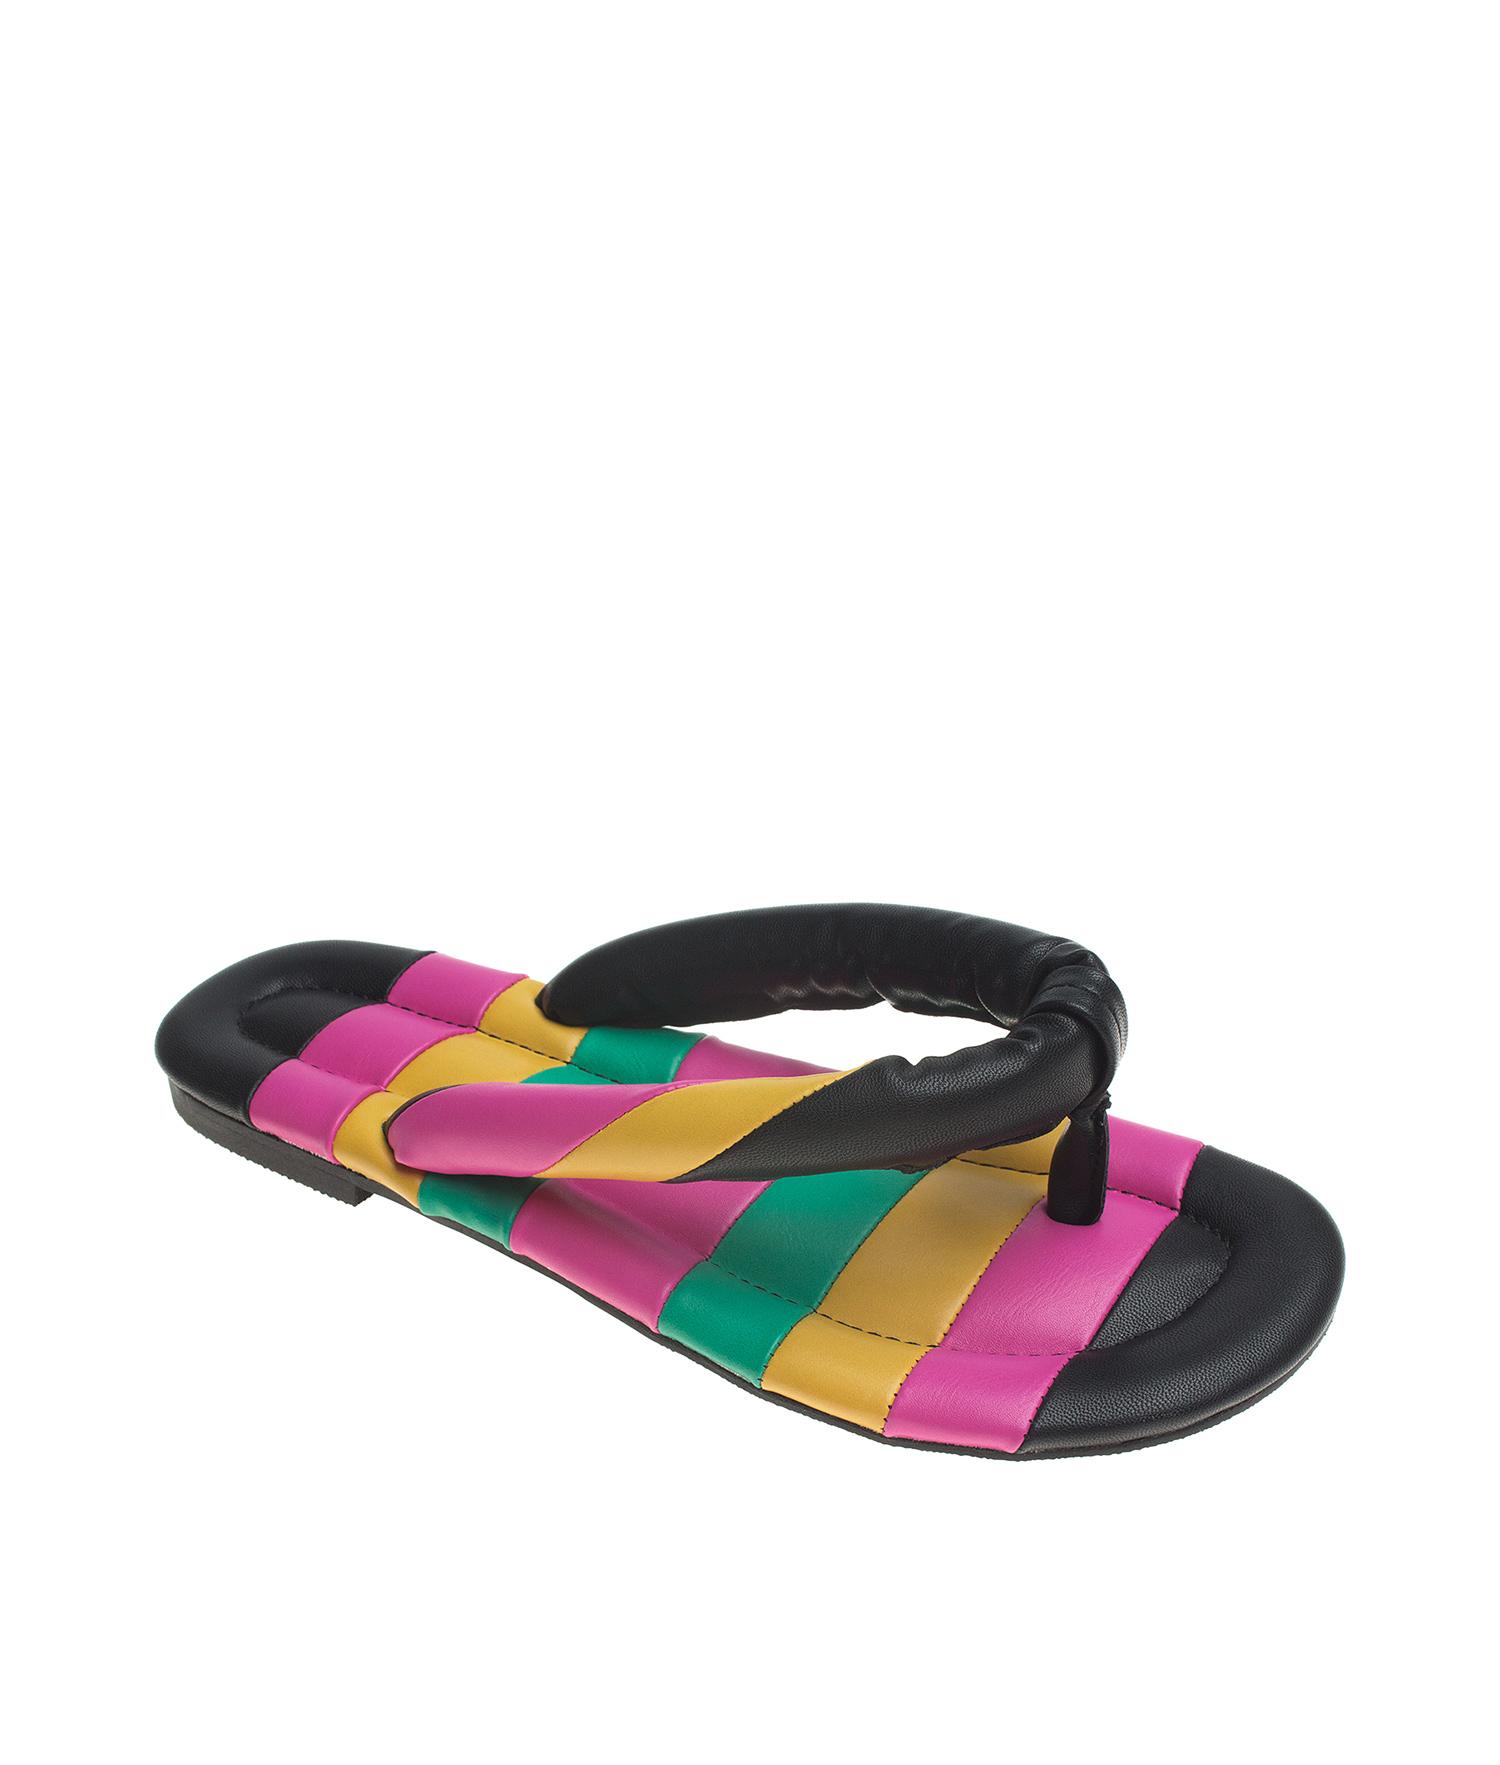 c5f77fdcb AnnaKastle Womens Color Block Flip Flops Slide Sandals PinkMulti